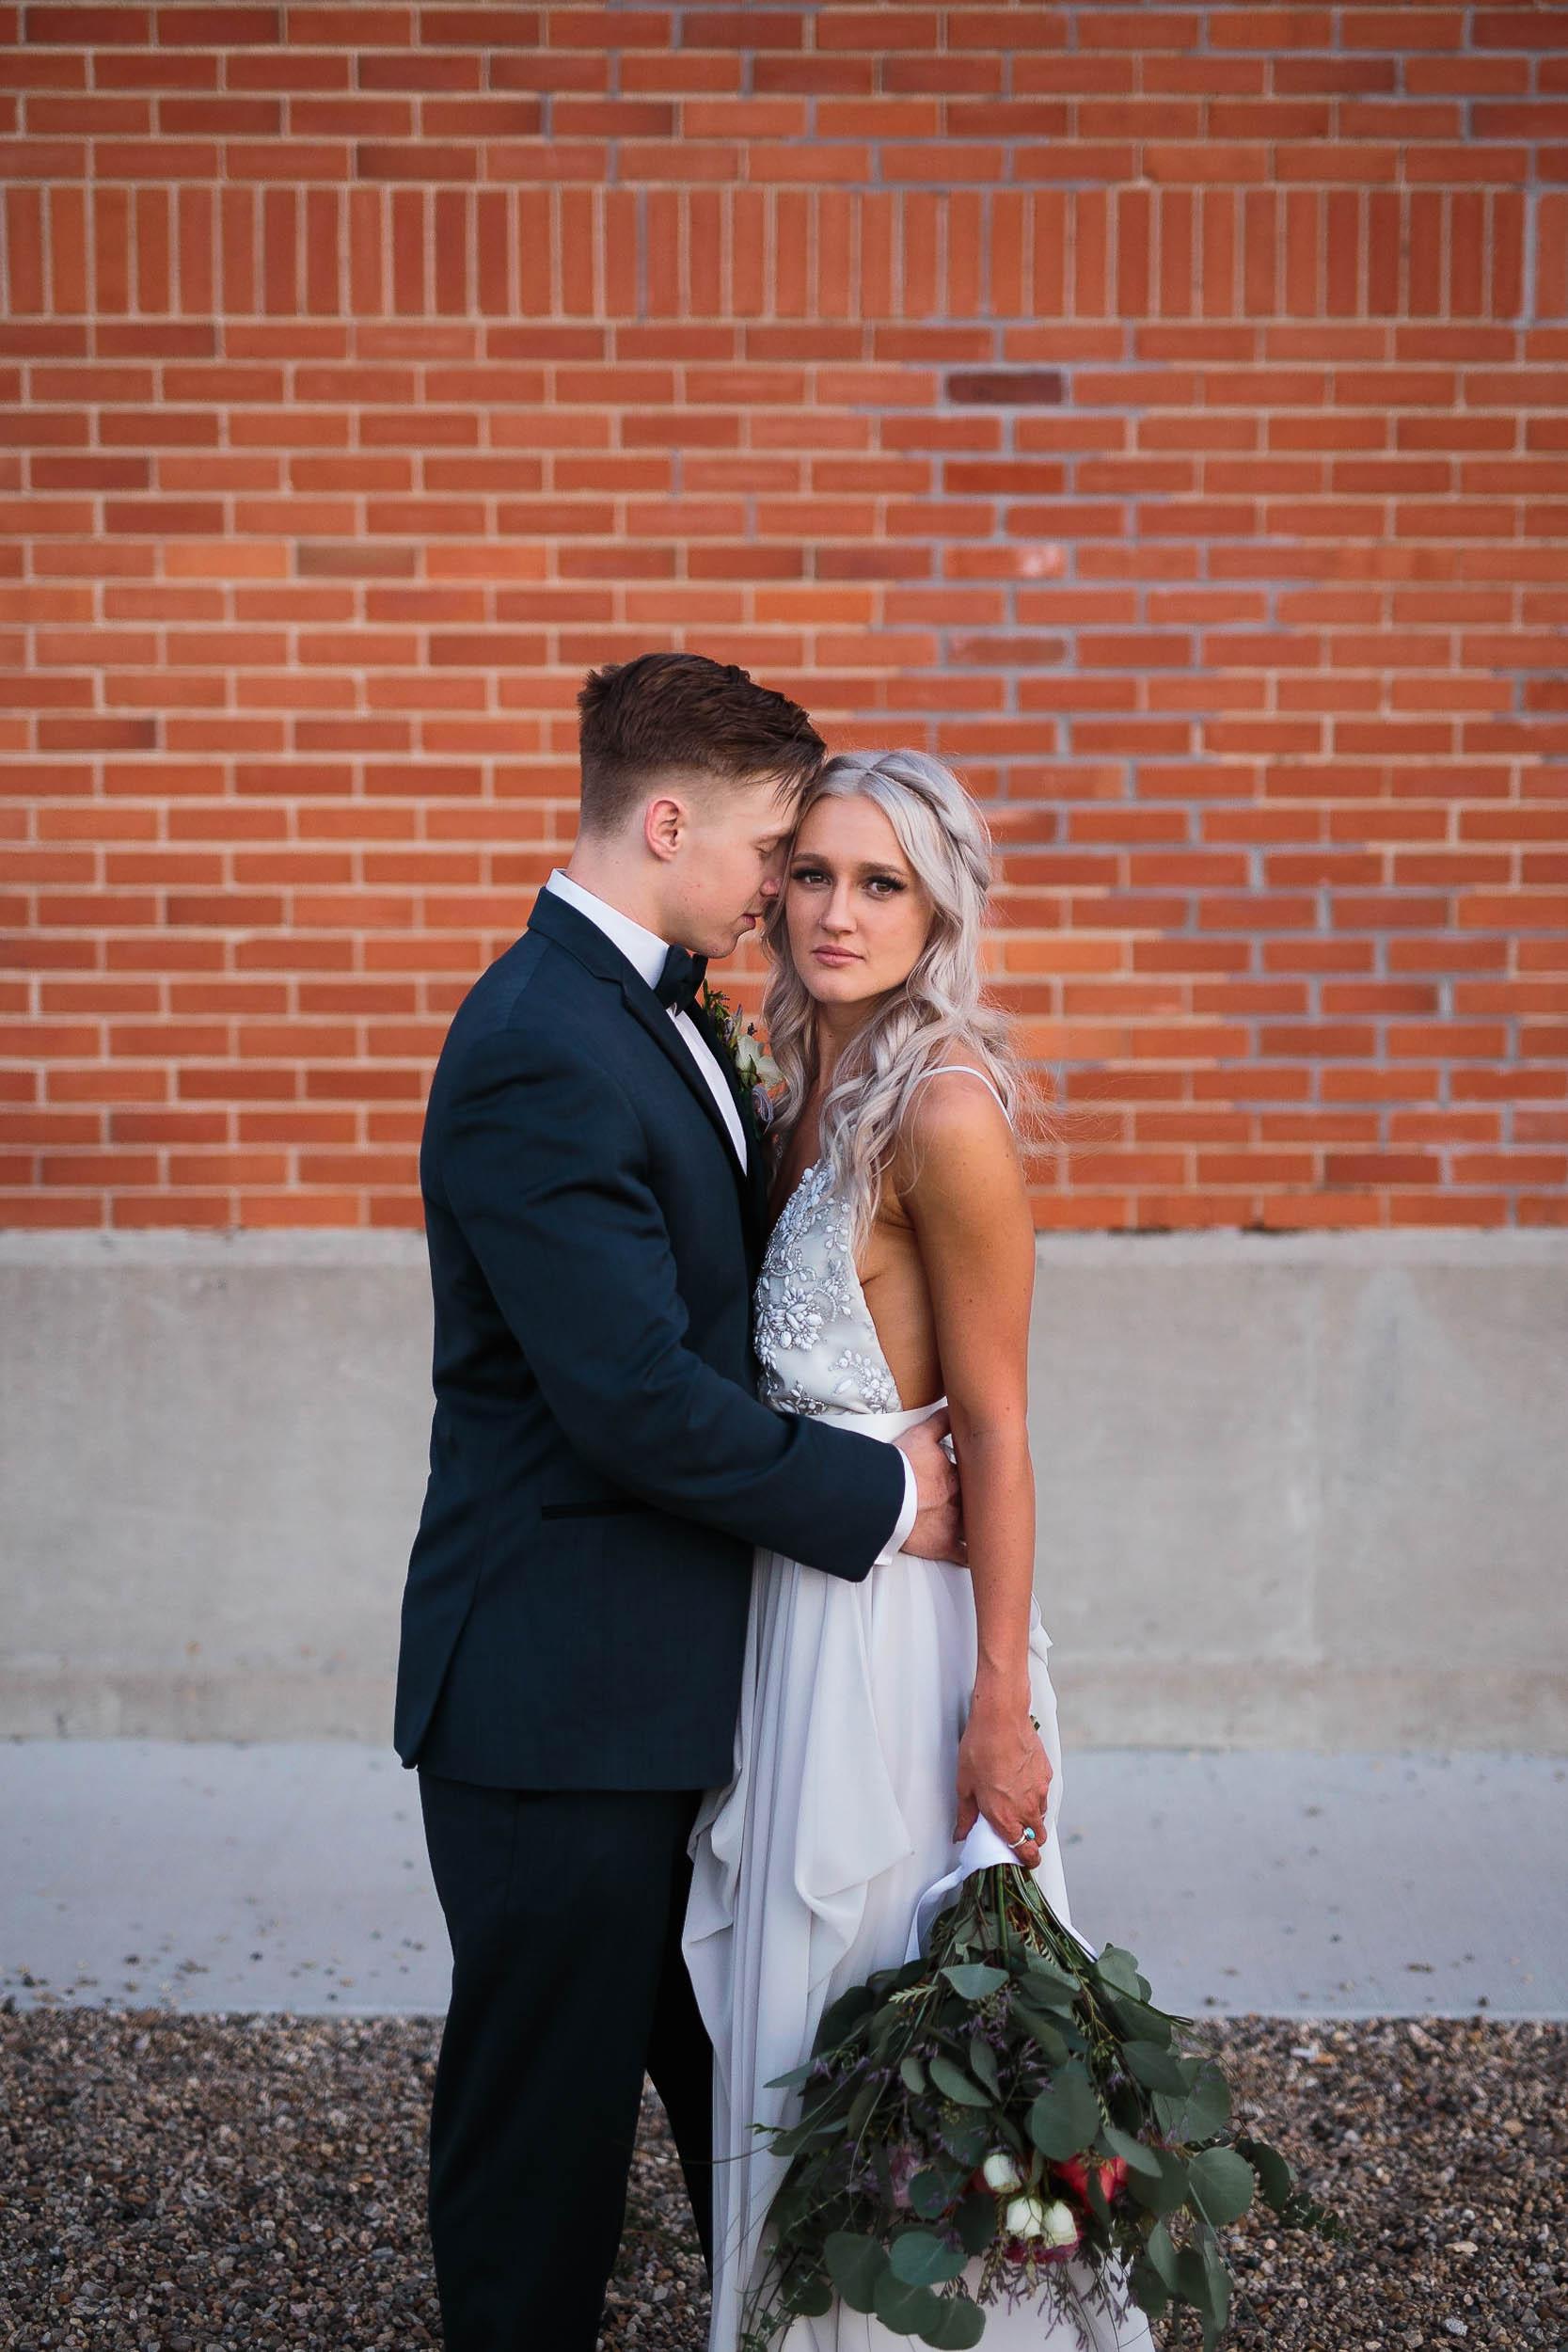 KyleLovesTori-Casper-Wyoming-Wedding-146.jpg